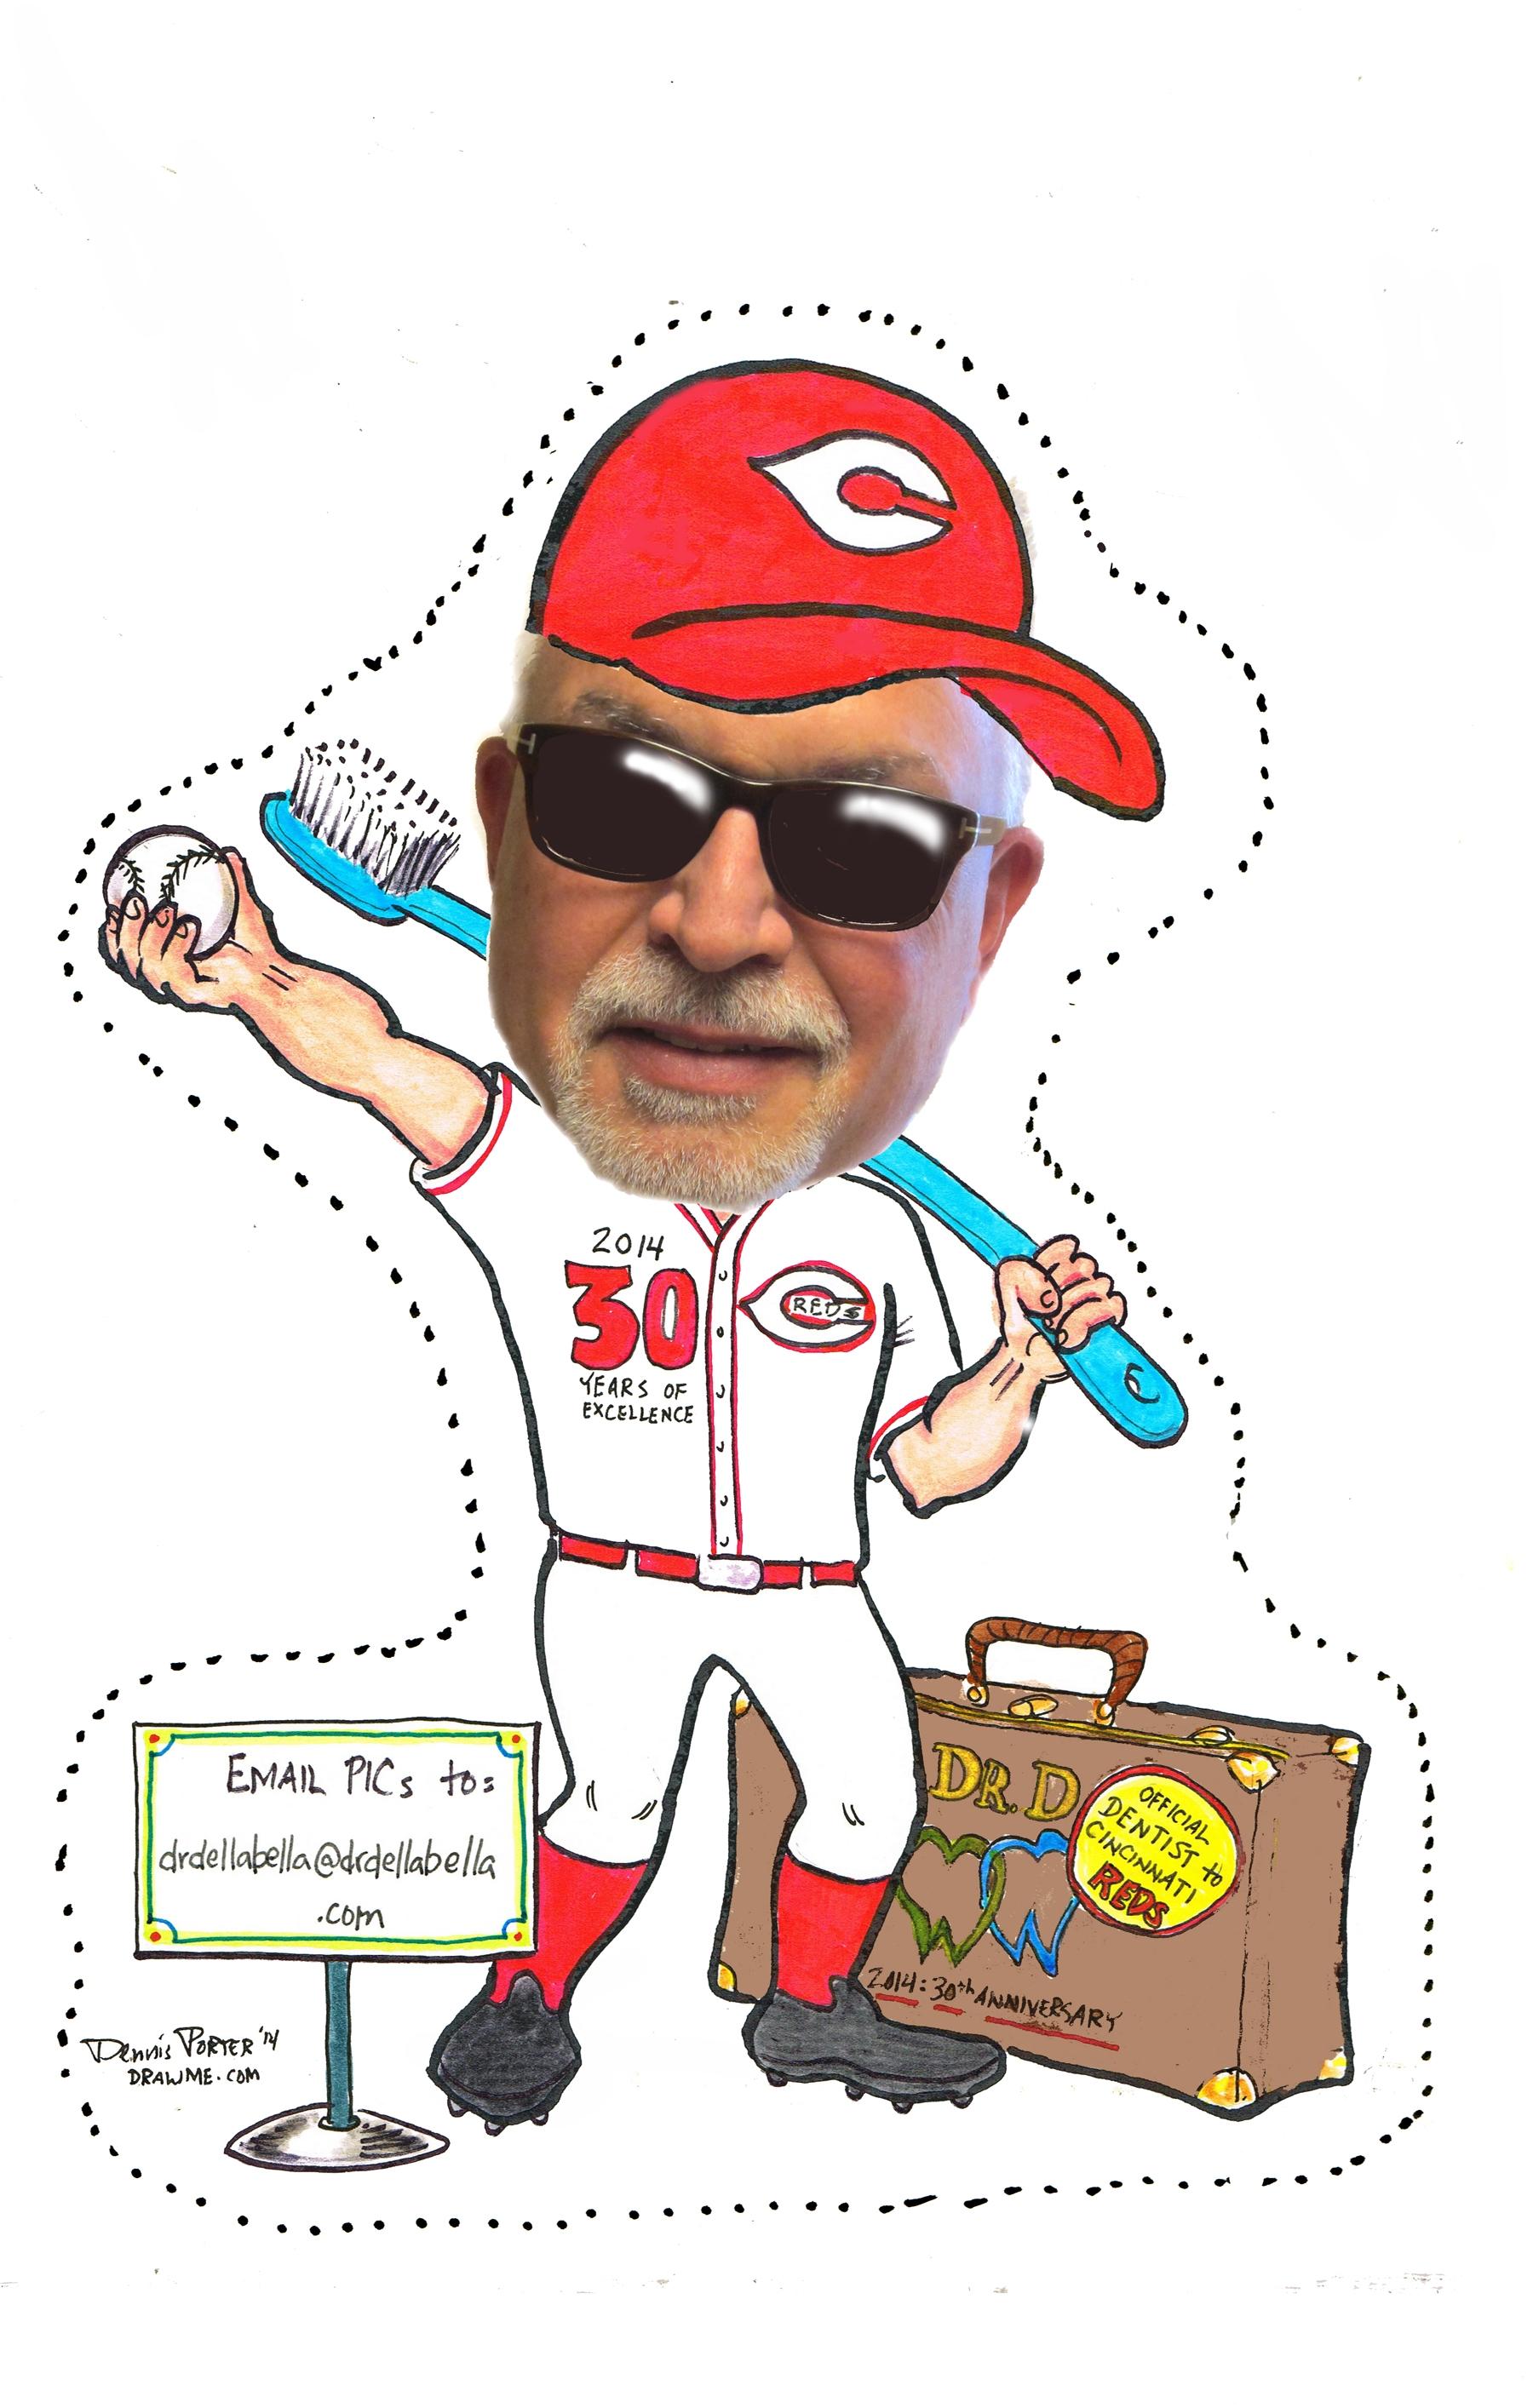 Baseball player doc